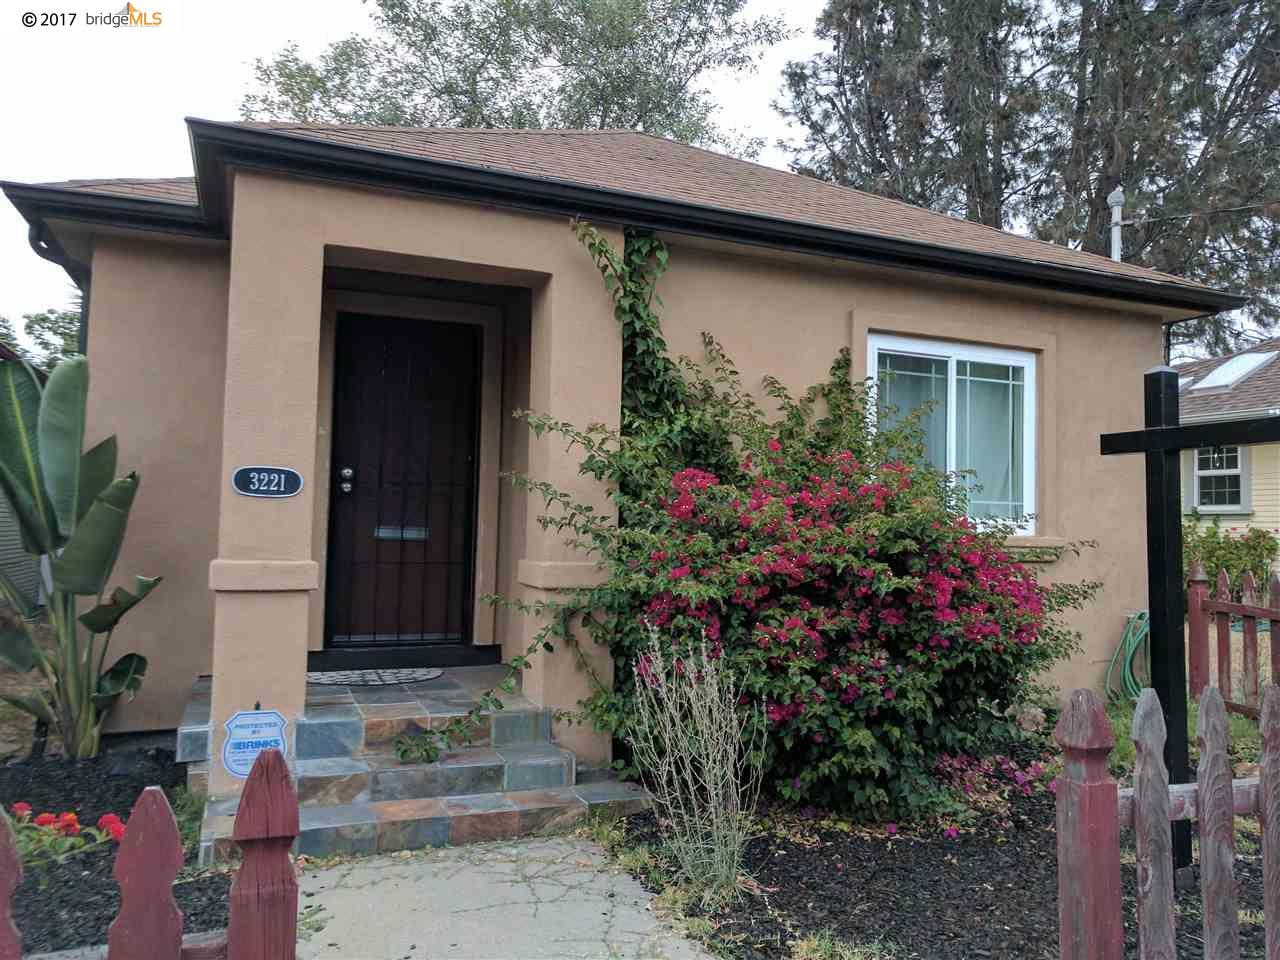 3221 Lorenzo Ave, OAKLAND, CA 94619